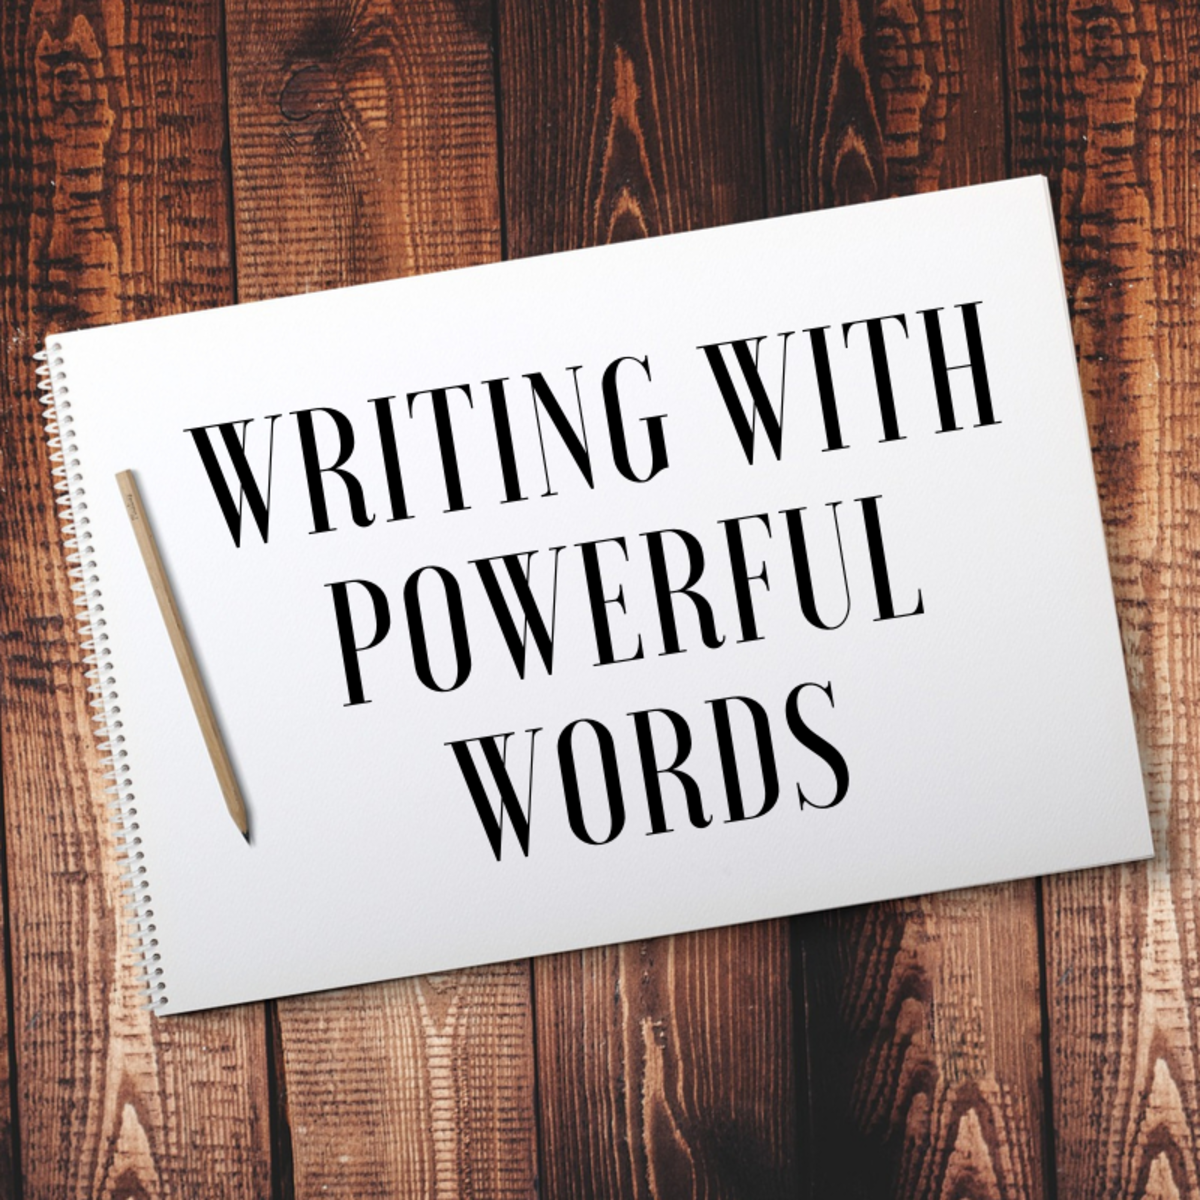 Powerful Words Make Powerful Prose